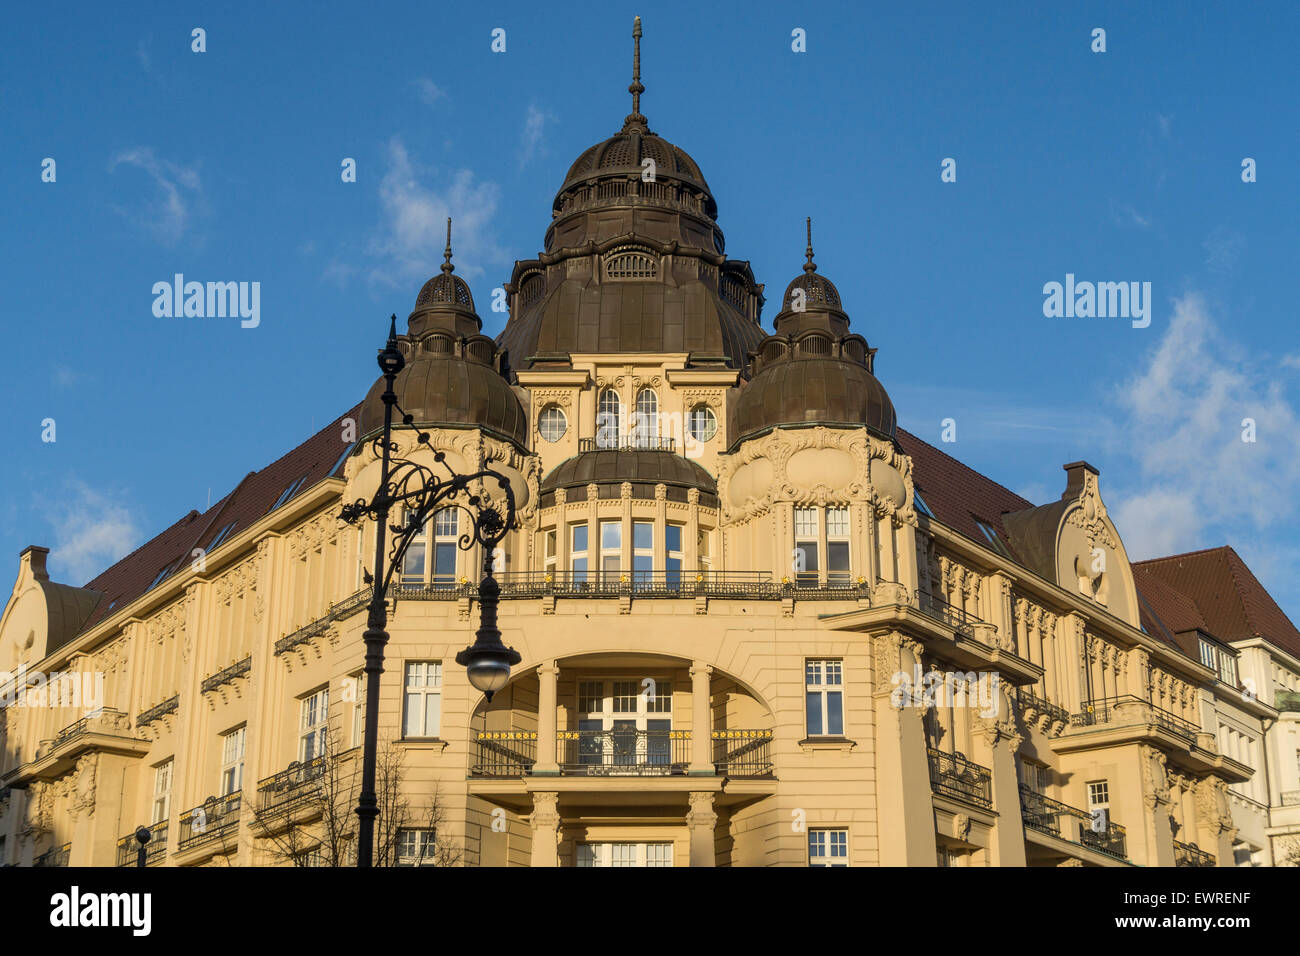 Kurfurstendamm, Luxery Building, Real Estate, City West, Berlin - Stock Image